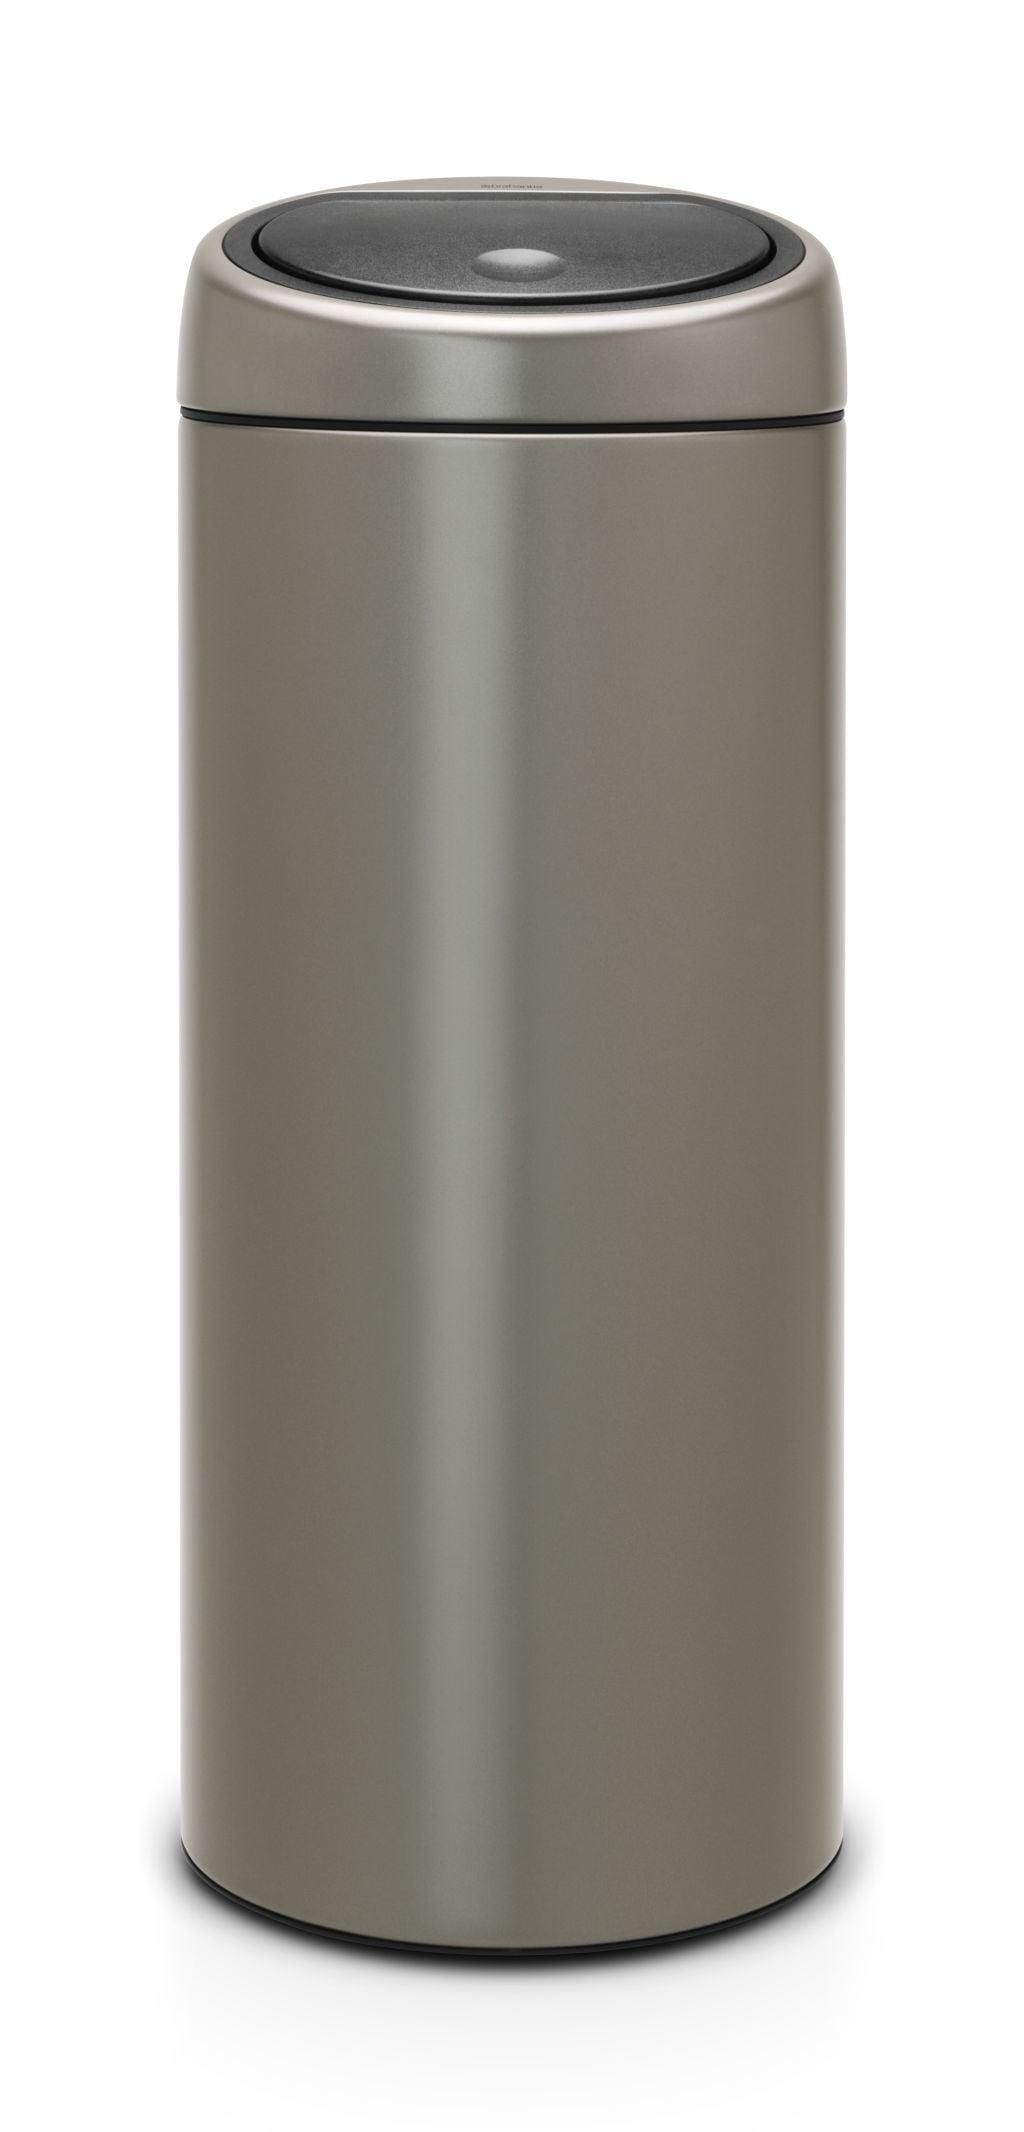 Brabantia Touch Bin Afvalverzamelaar 30 Liter.Brabantia Afvalverzamelaar 30 Liter Touch Bin Platinum Brabantia Afvalverzamelaar 30 Liter Touch Bin Platinum